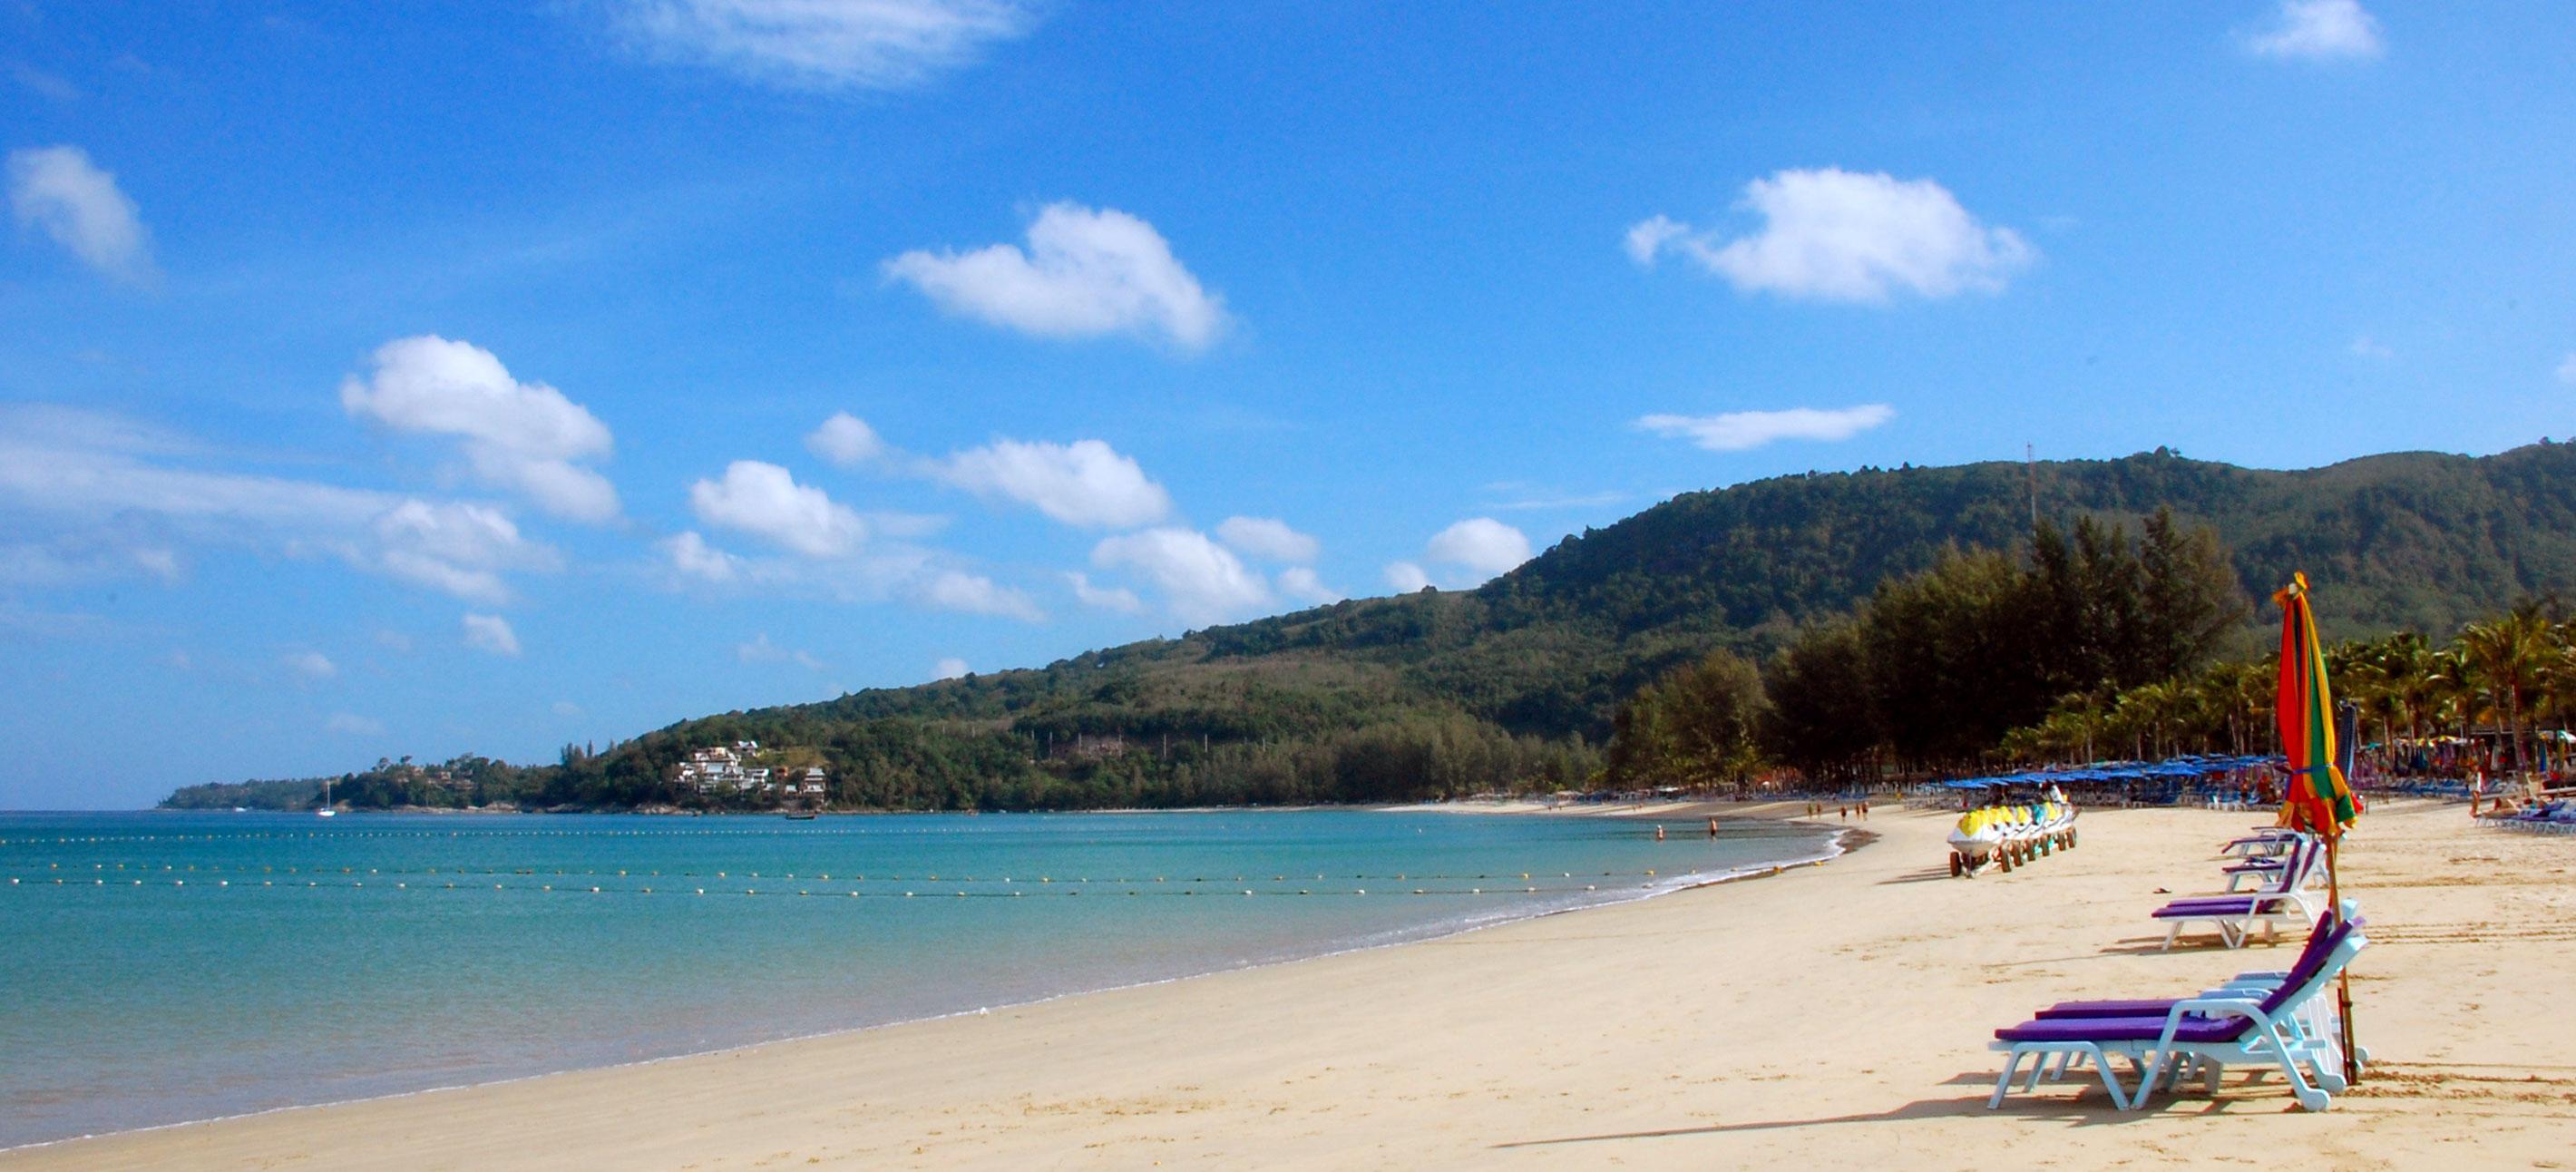 Big beach1